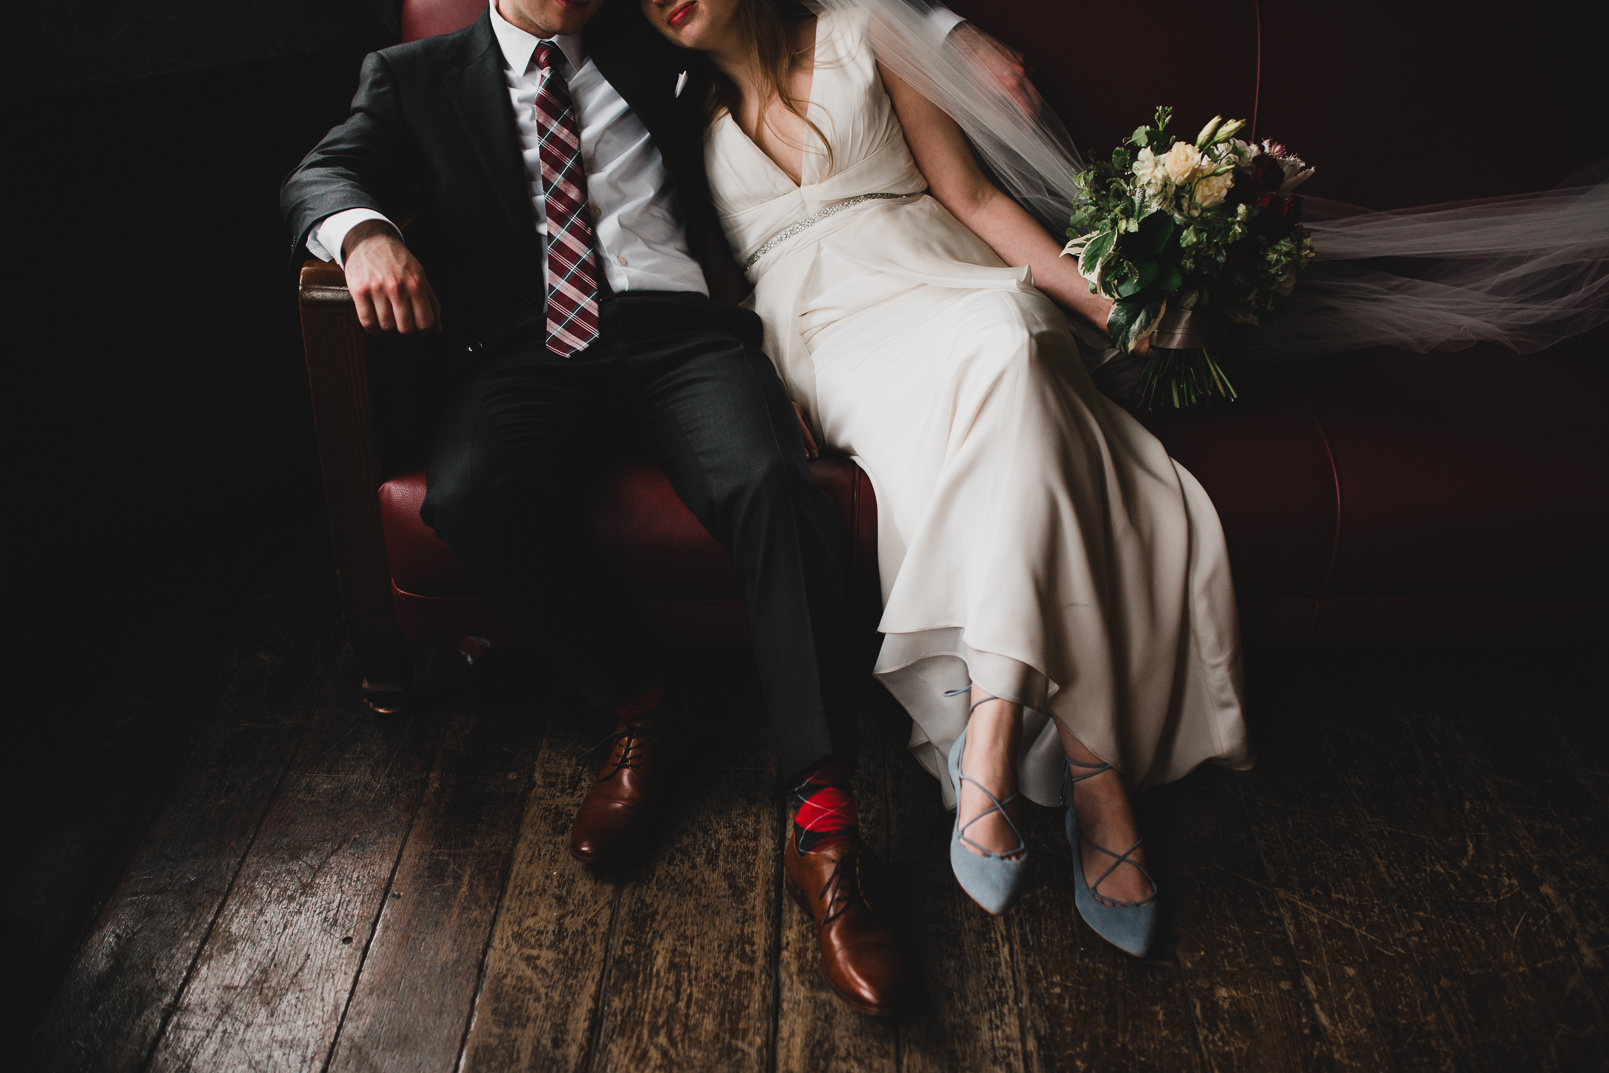 004-Jonathan-Kuhn-Photography-Wedding-_mini.jpg